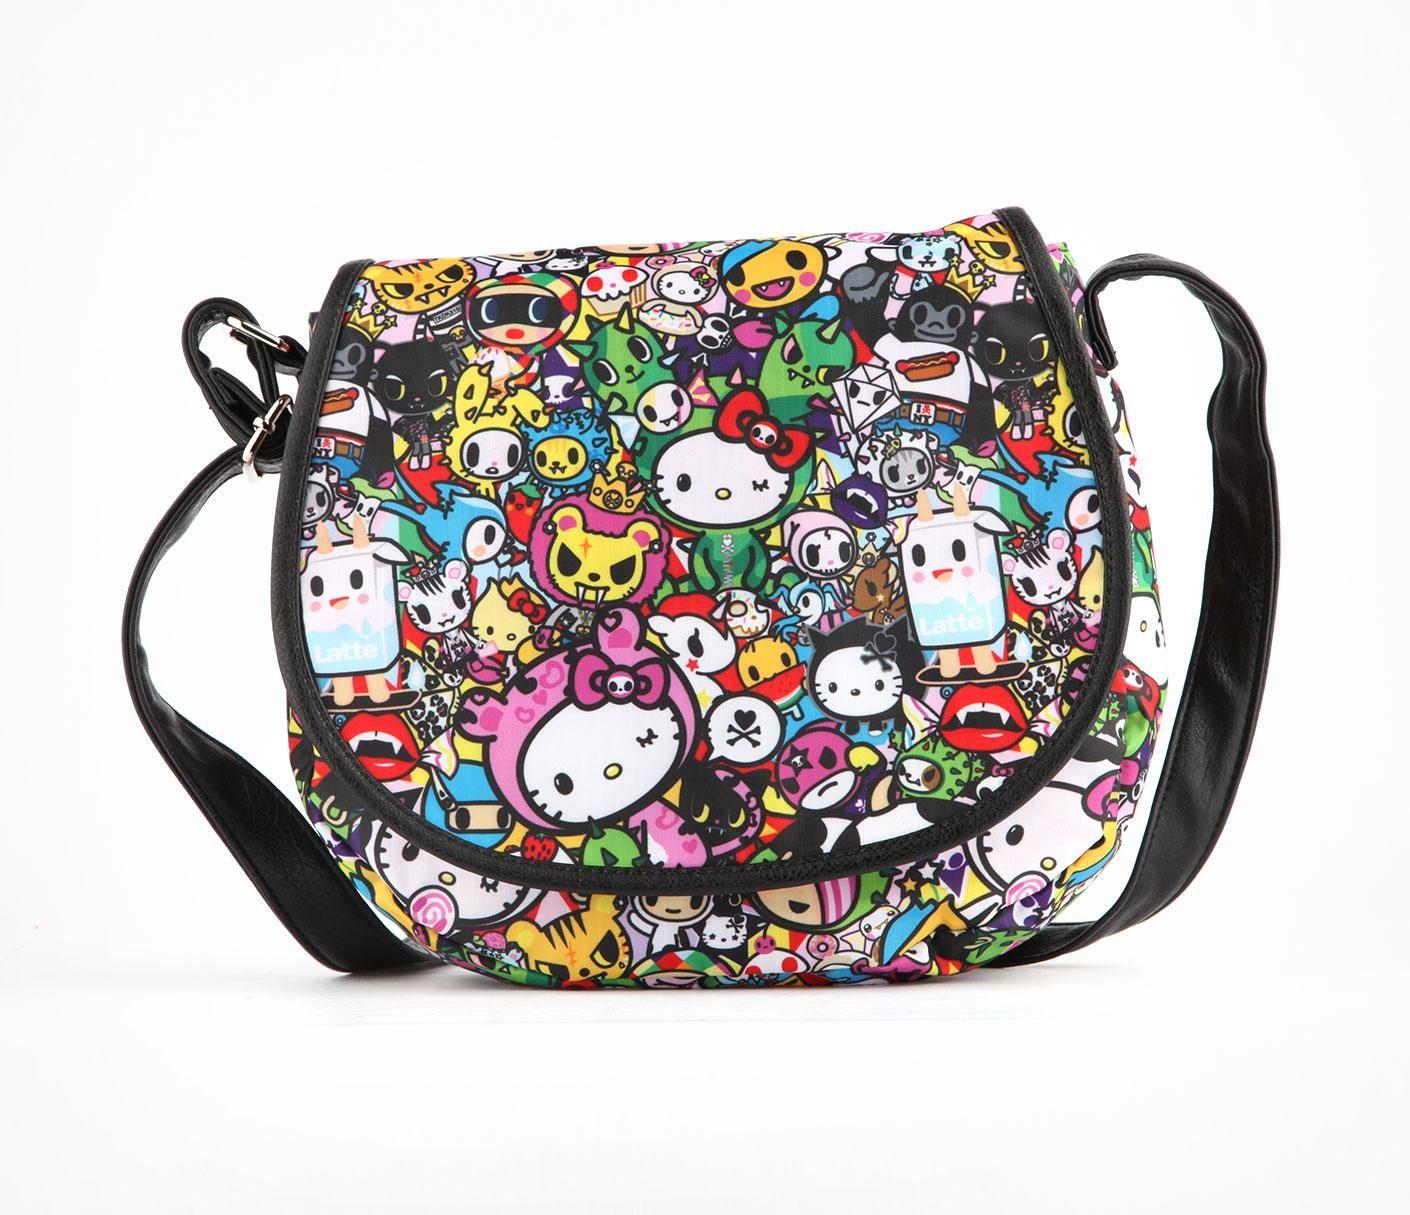 9206bb907 tokidoki x Hello Kitty Crossbody Bag: Reunion | Geeky Stuff I need ...